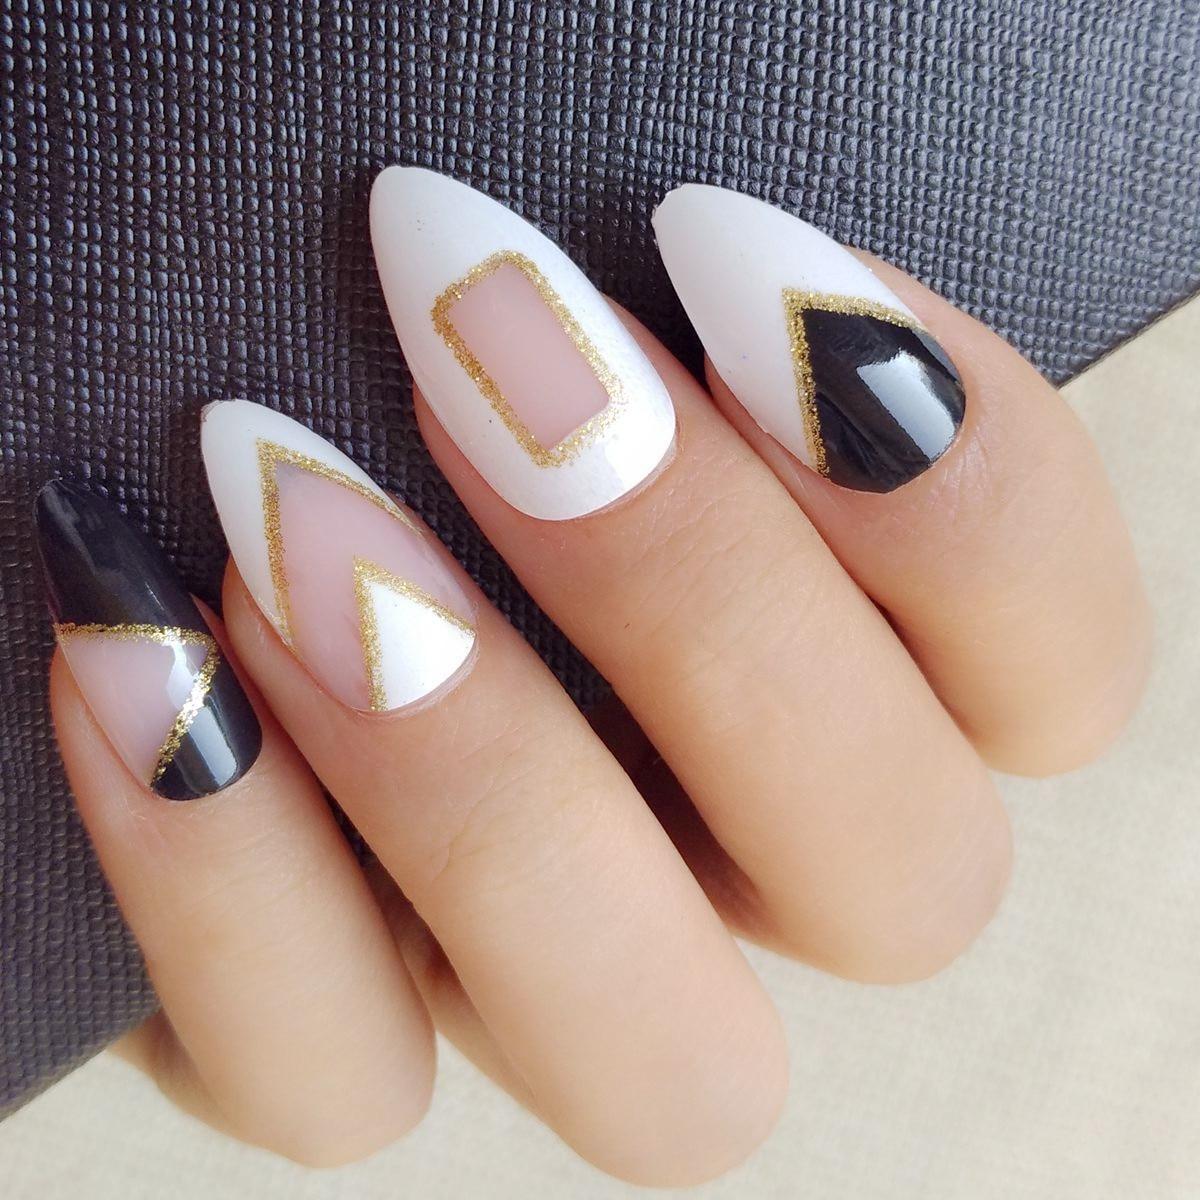 klare schwarze weie kurze stiletto nails glitter acryl geflschte ngel winkel muster hafenpersenning falsche nagelspitze 24 - Nails Muster